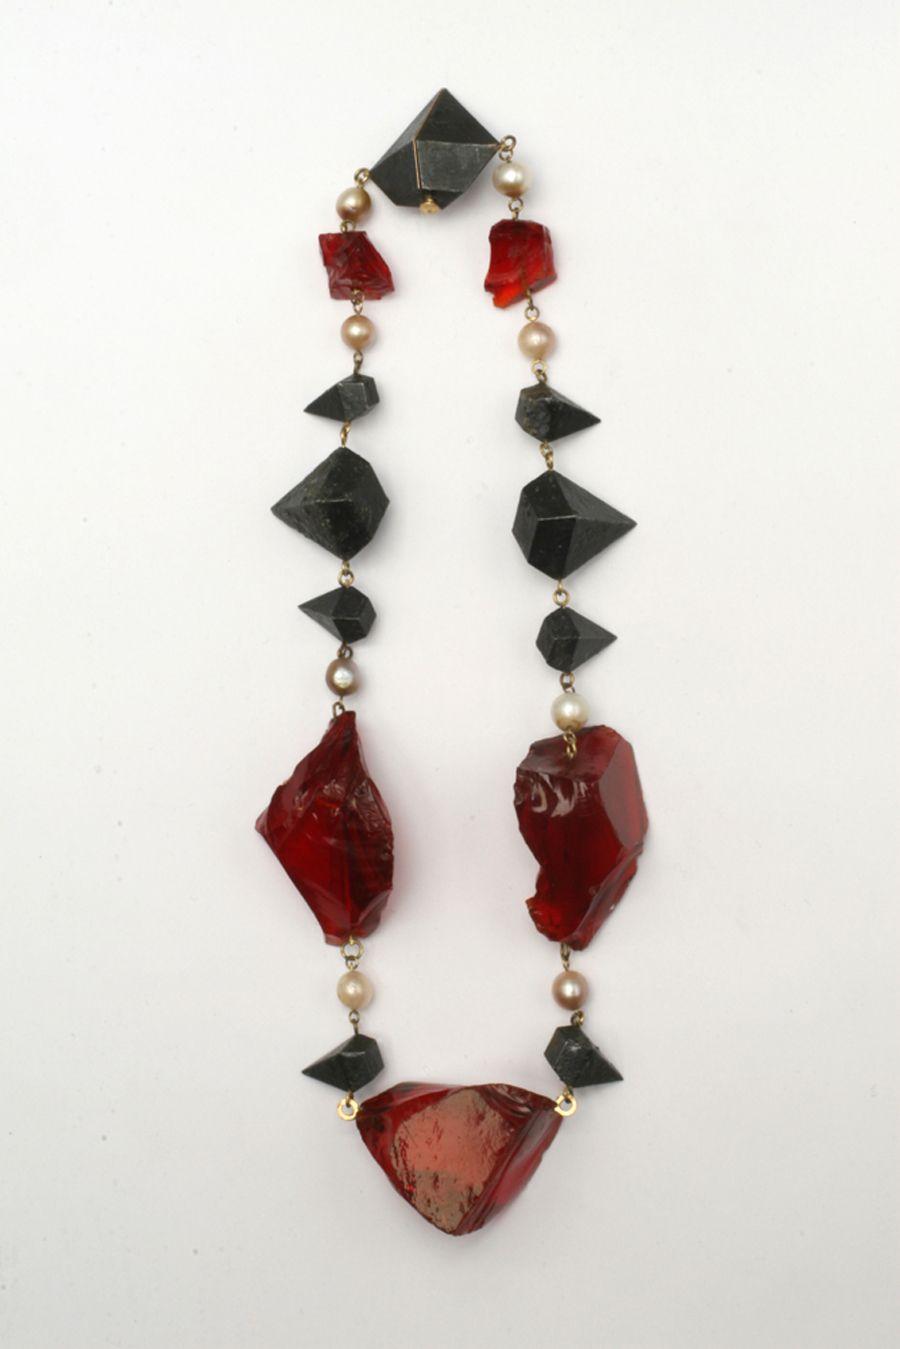 Philip Sajet, Broken Blood, Black Diamonds and Pearls